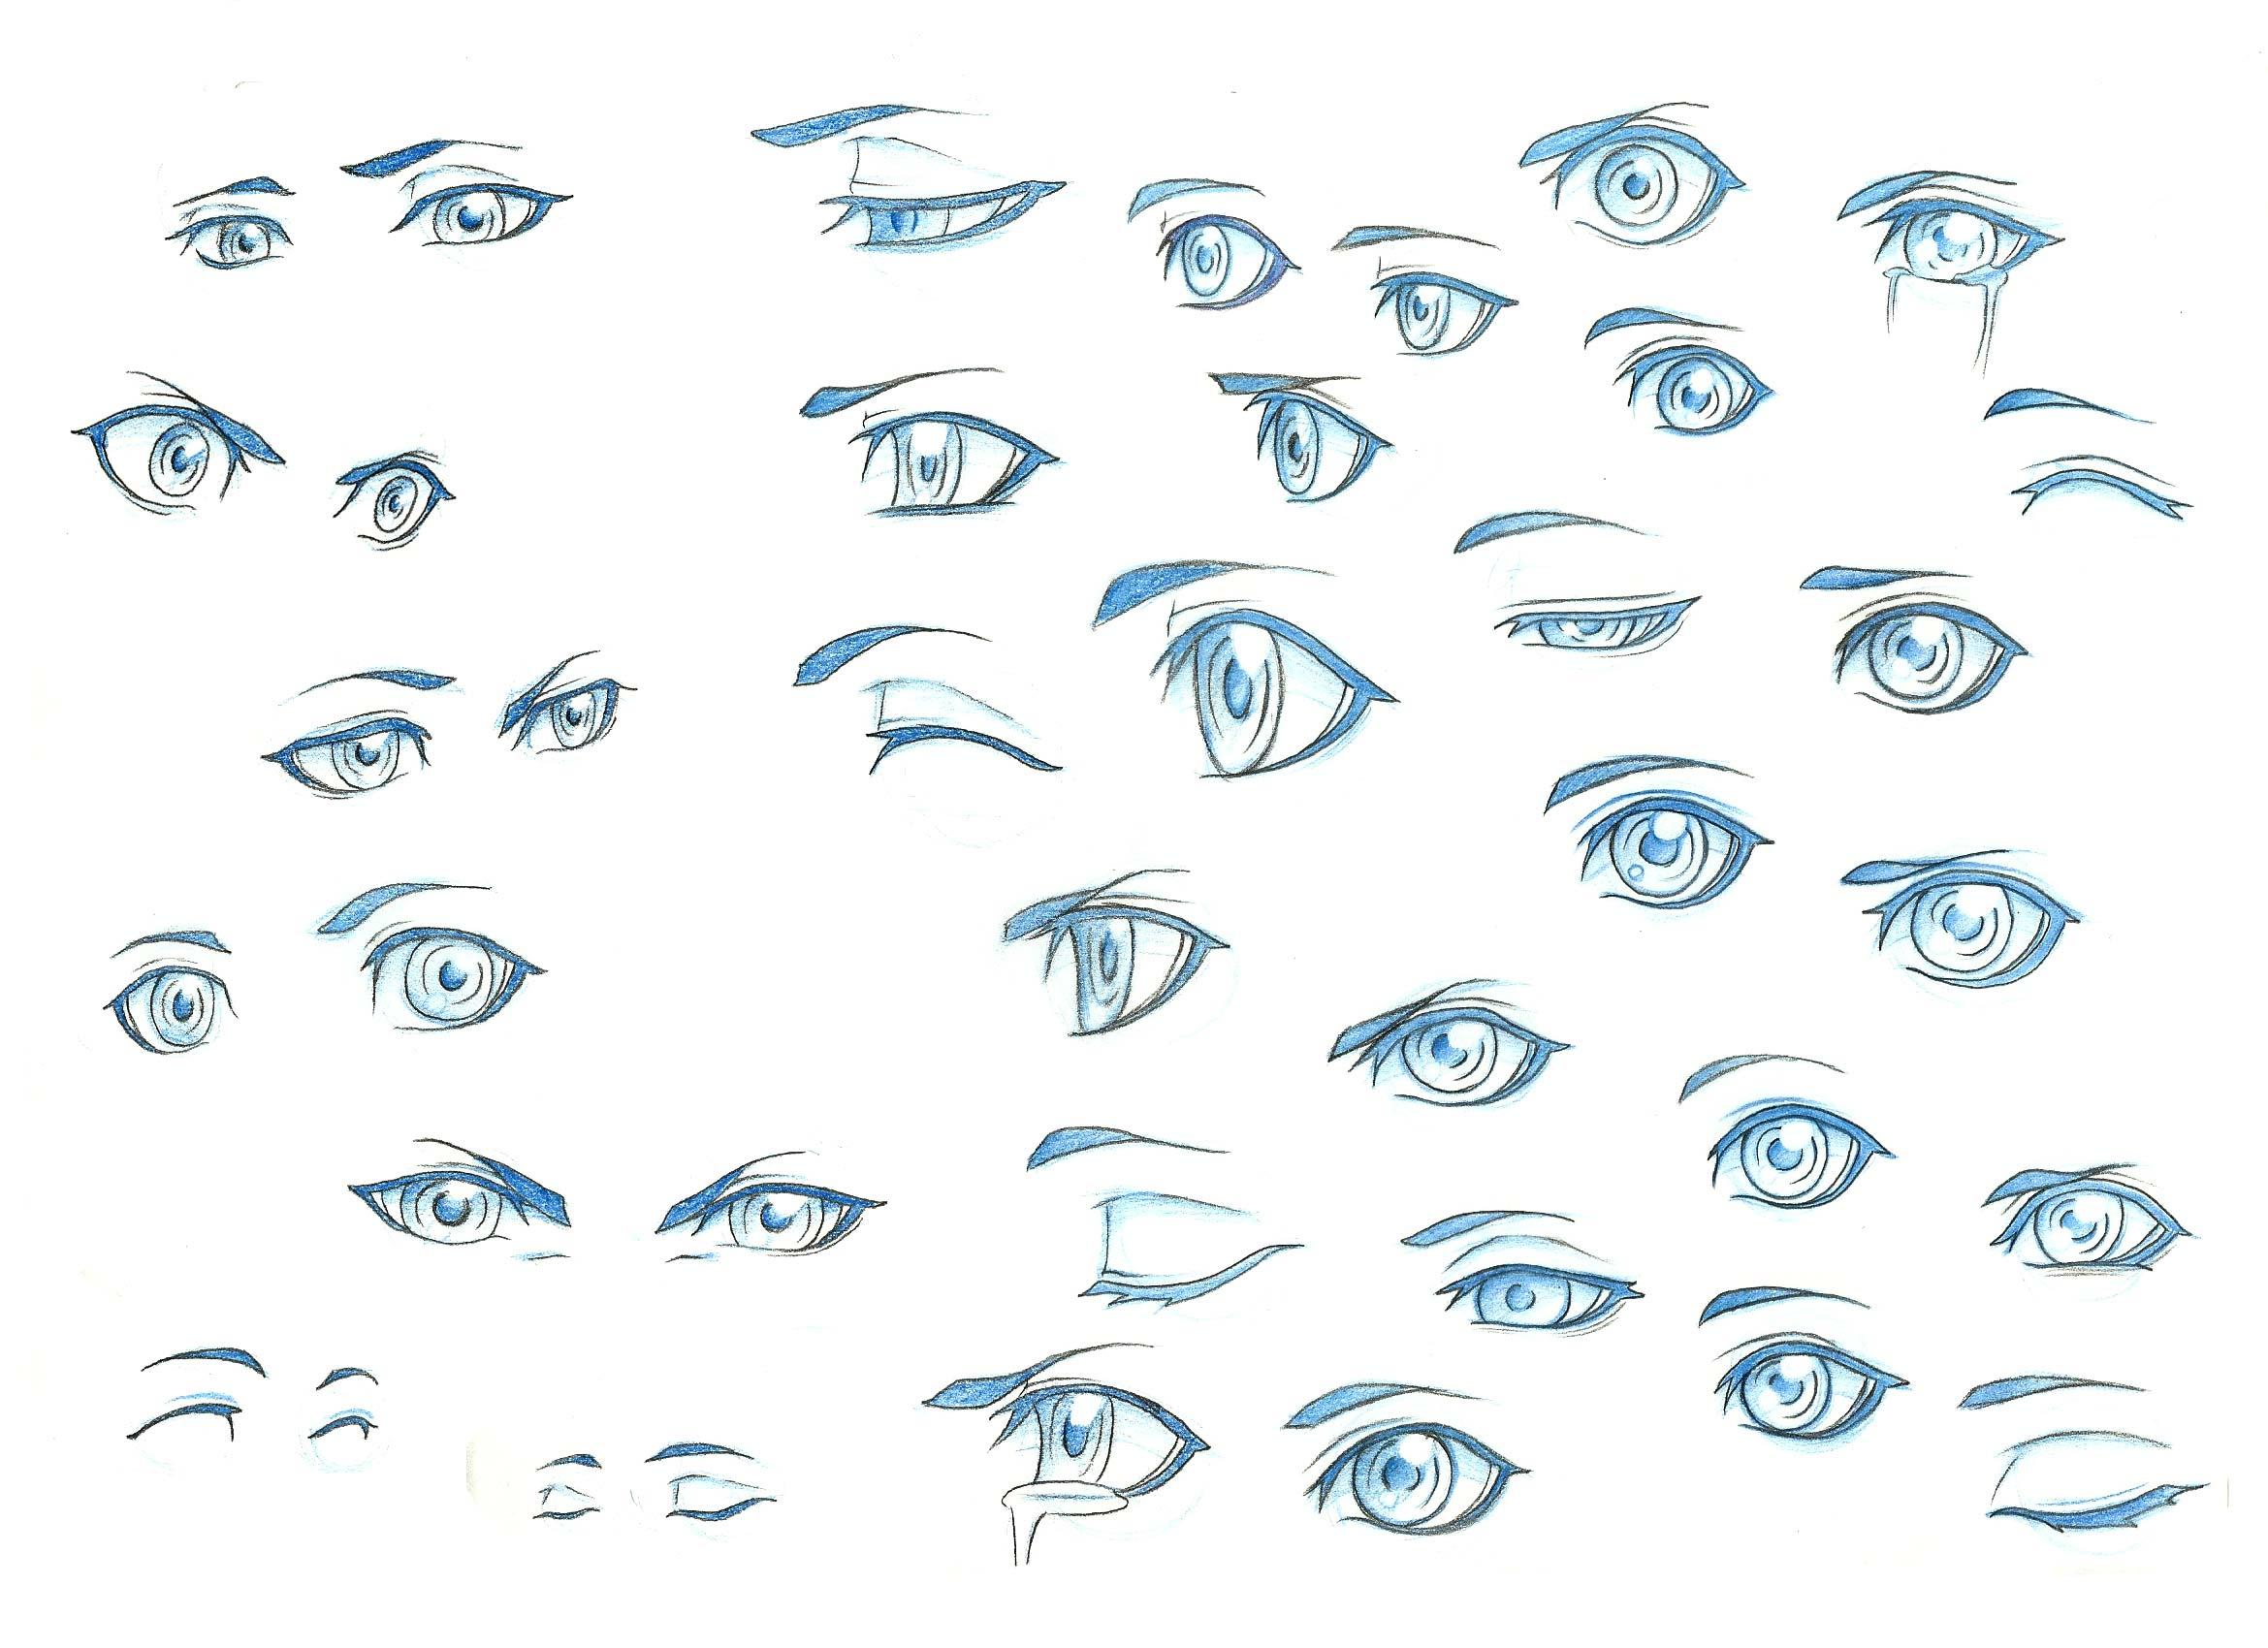 Anime and manga eyes drawing reference